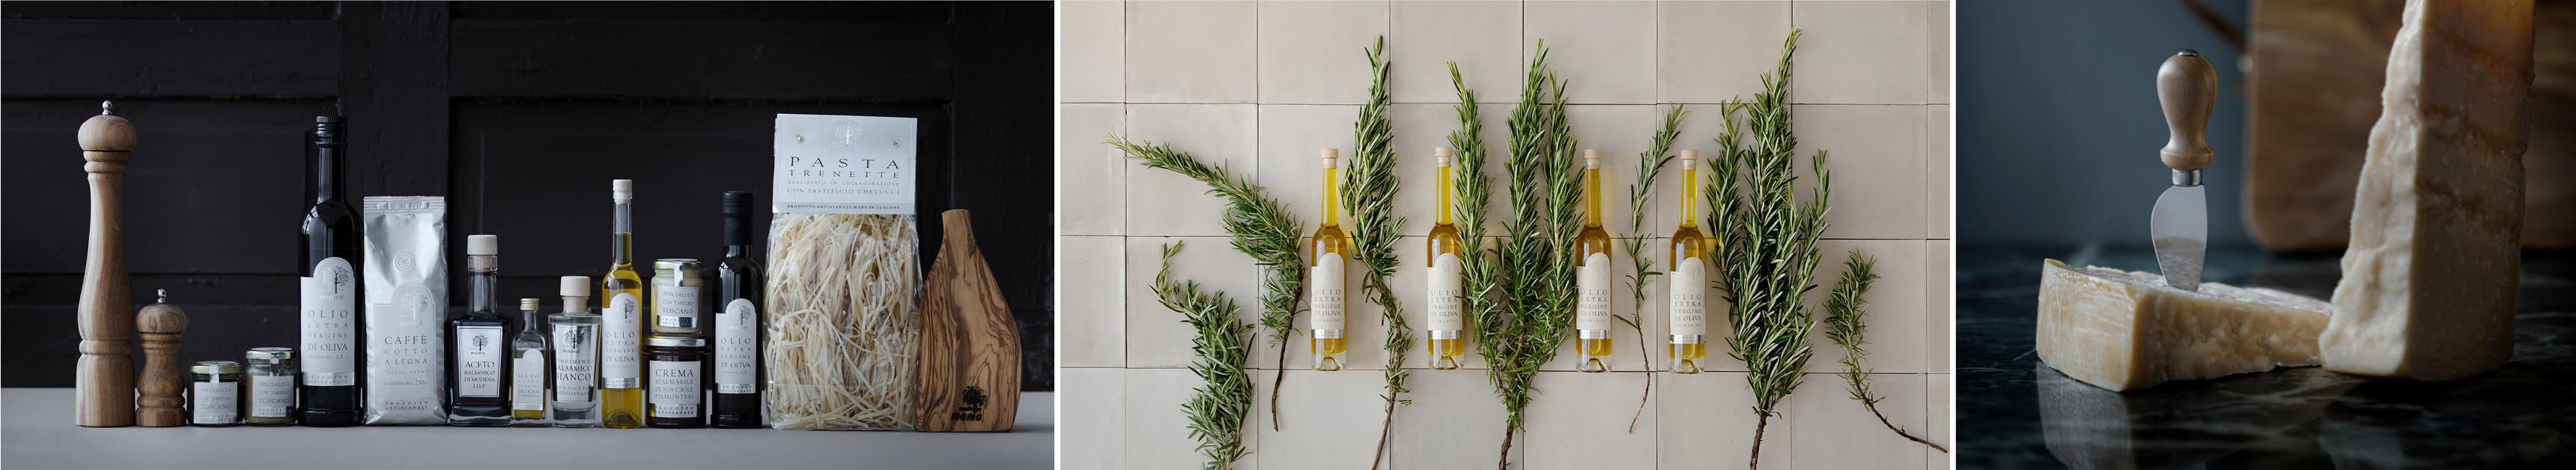 Made-by-Mama-parmesan-olivenolje-krydder.jpg